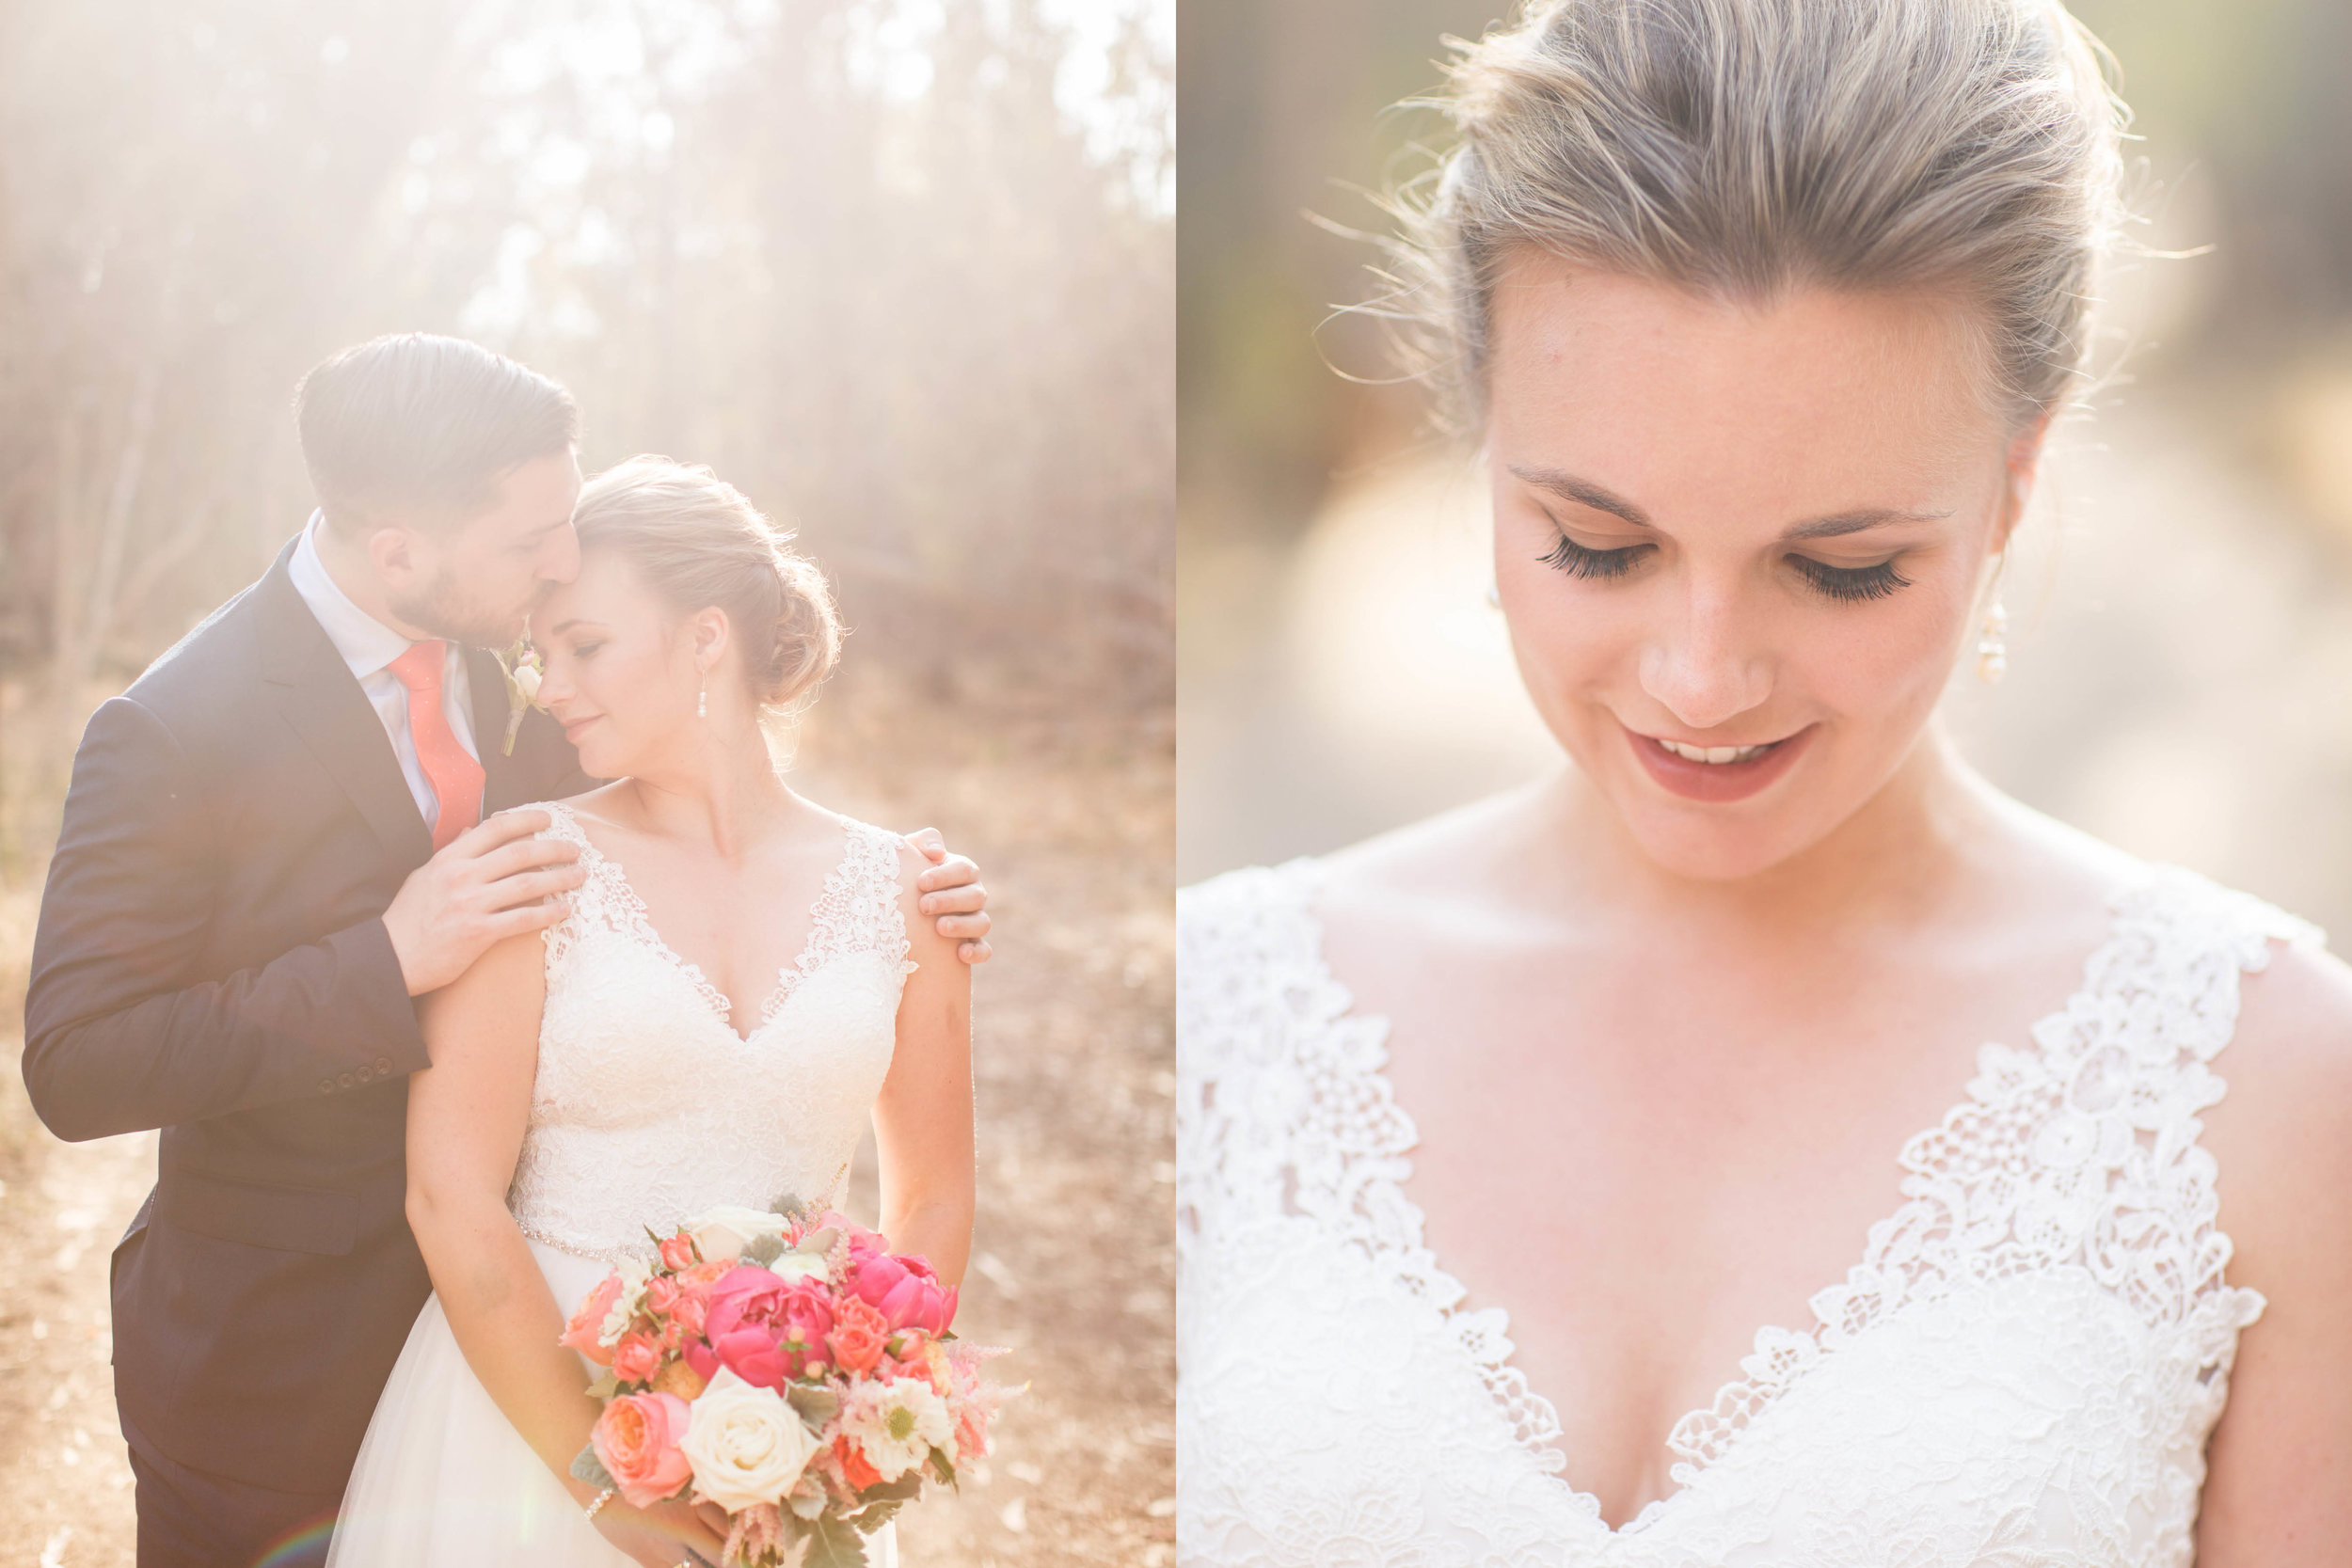 santa-barbara-elopement-elope-wedding-planning-planner-coordinator-day-of-rustic-ellwood-bluffs-beach-front-ocean-view (4).jpg